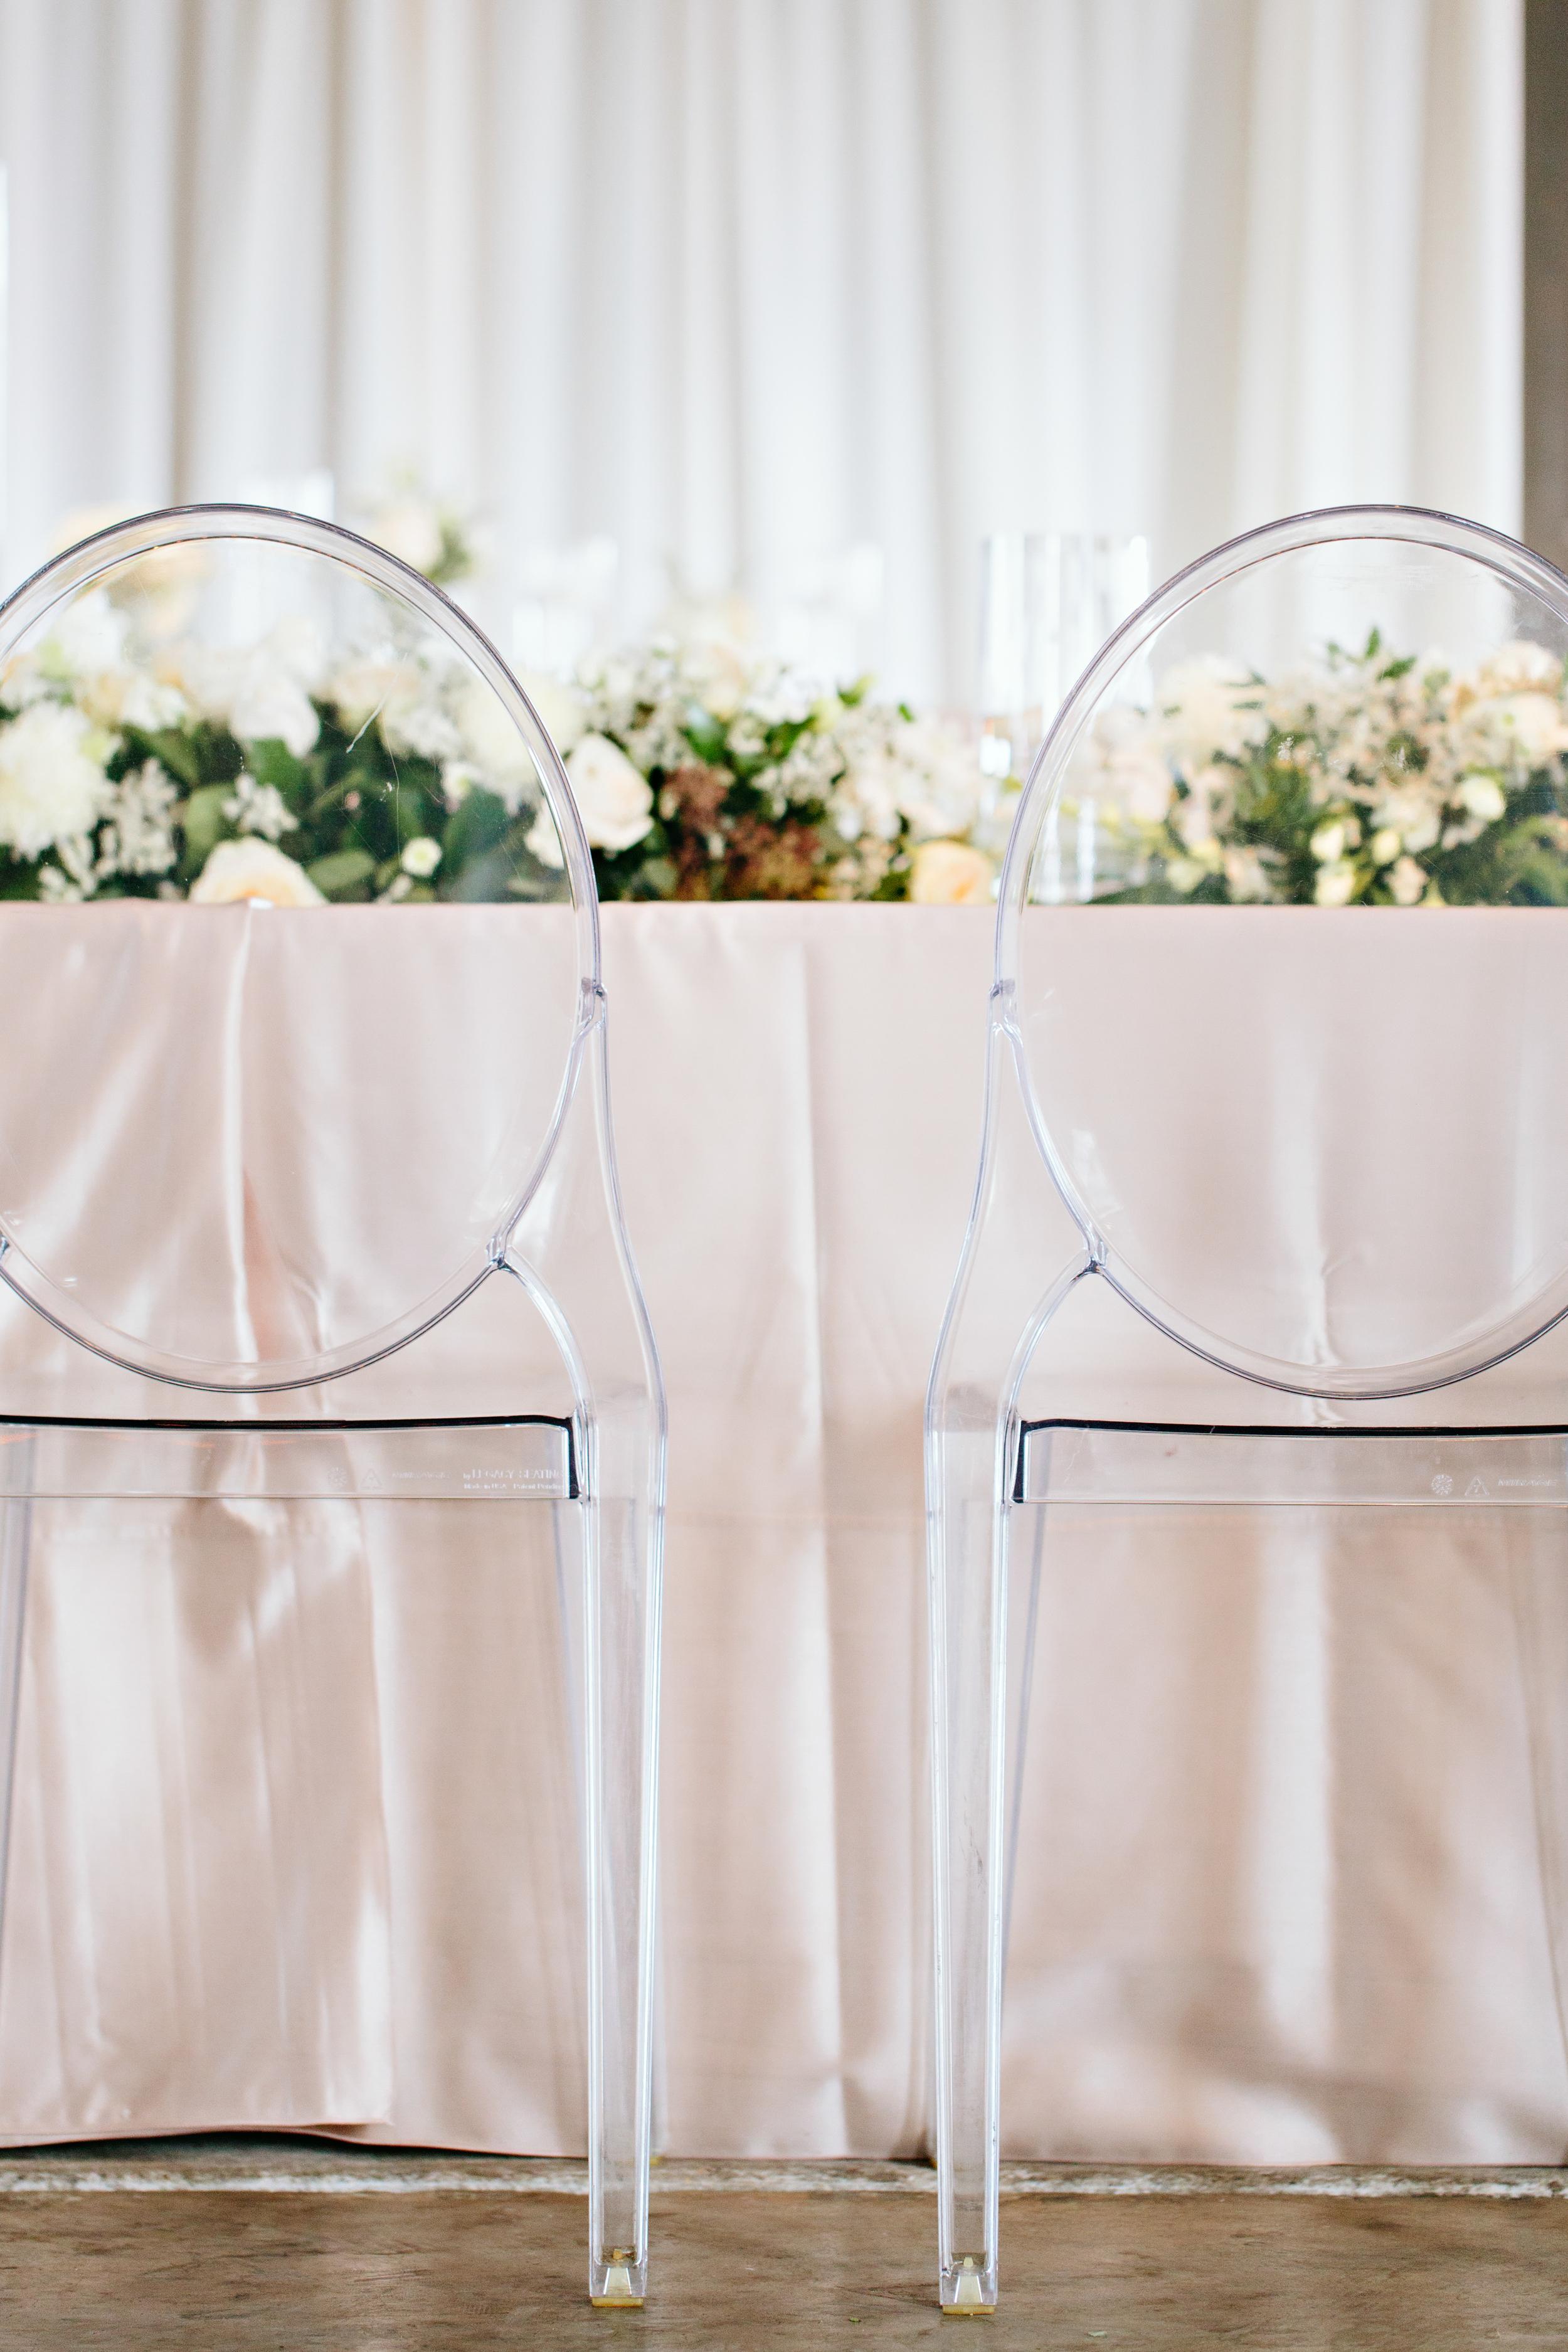 ghostchairs-acrylic-finery-fineryboutique-weddingplanner-weddingcoordinator-stylist-designer-alabama-tennessee-finerybride-southernwedding